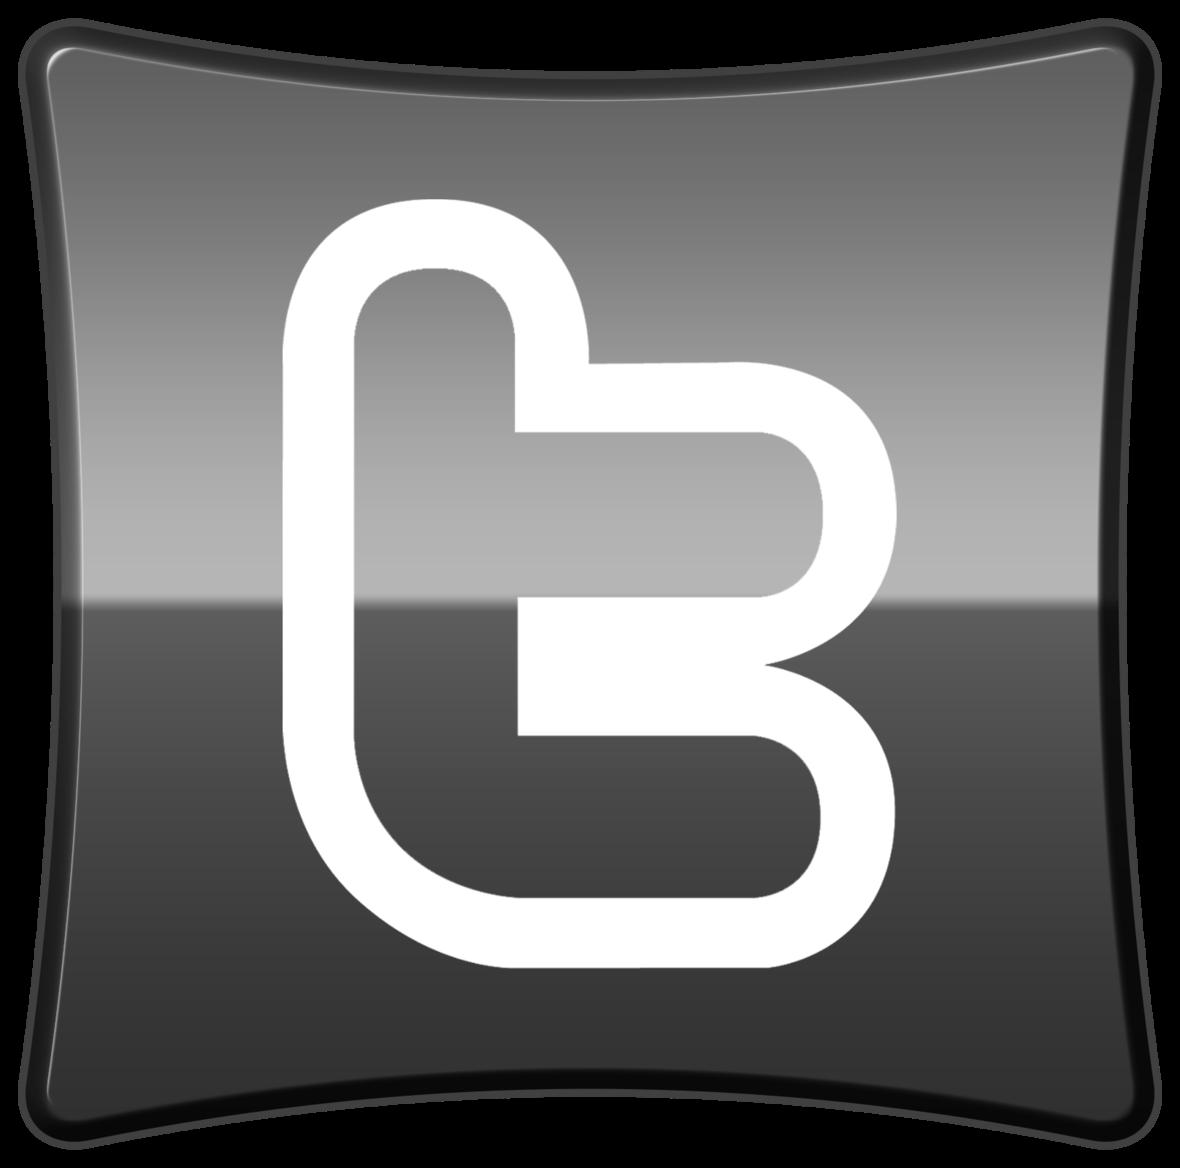 GreyTwitterButton